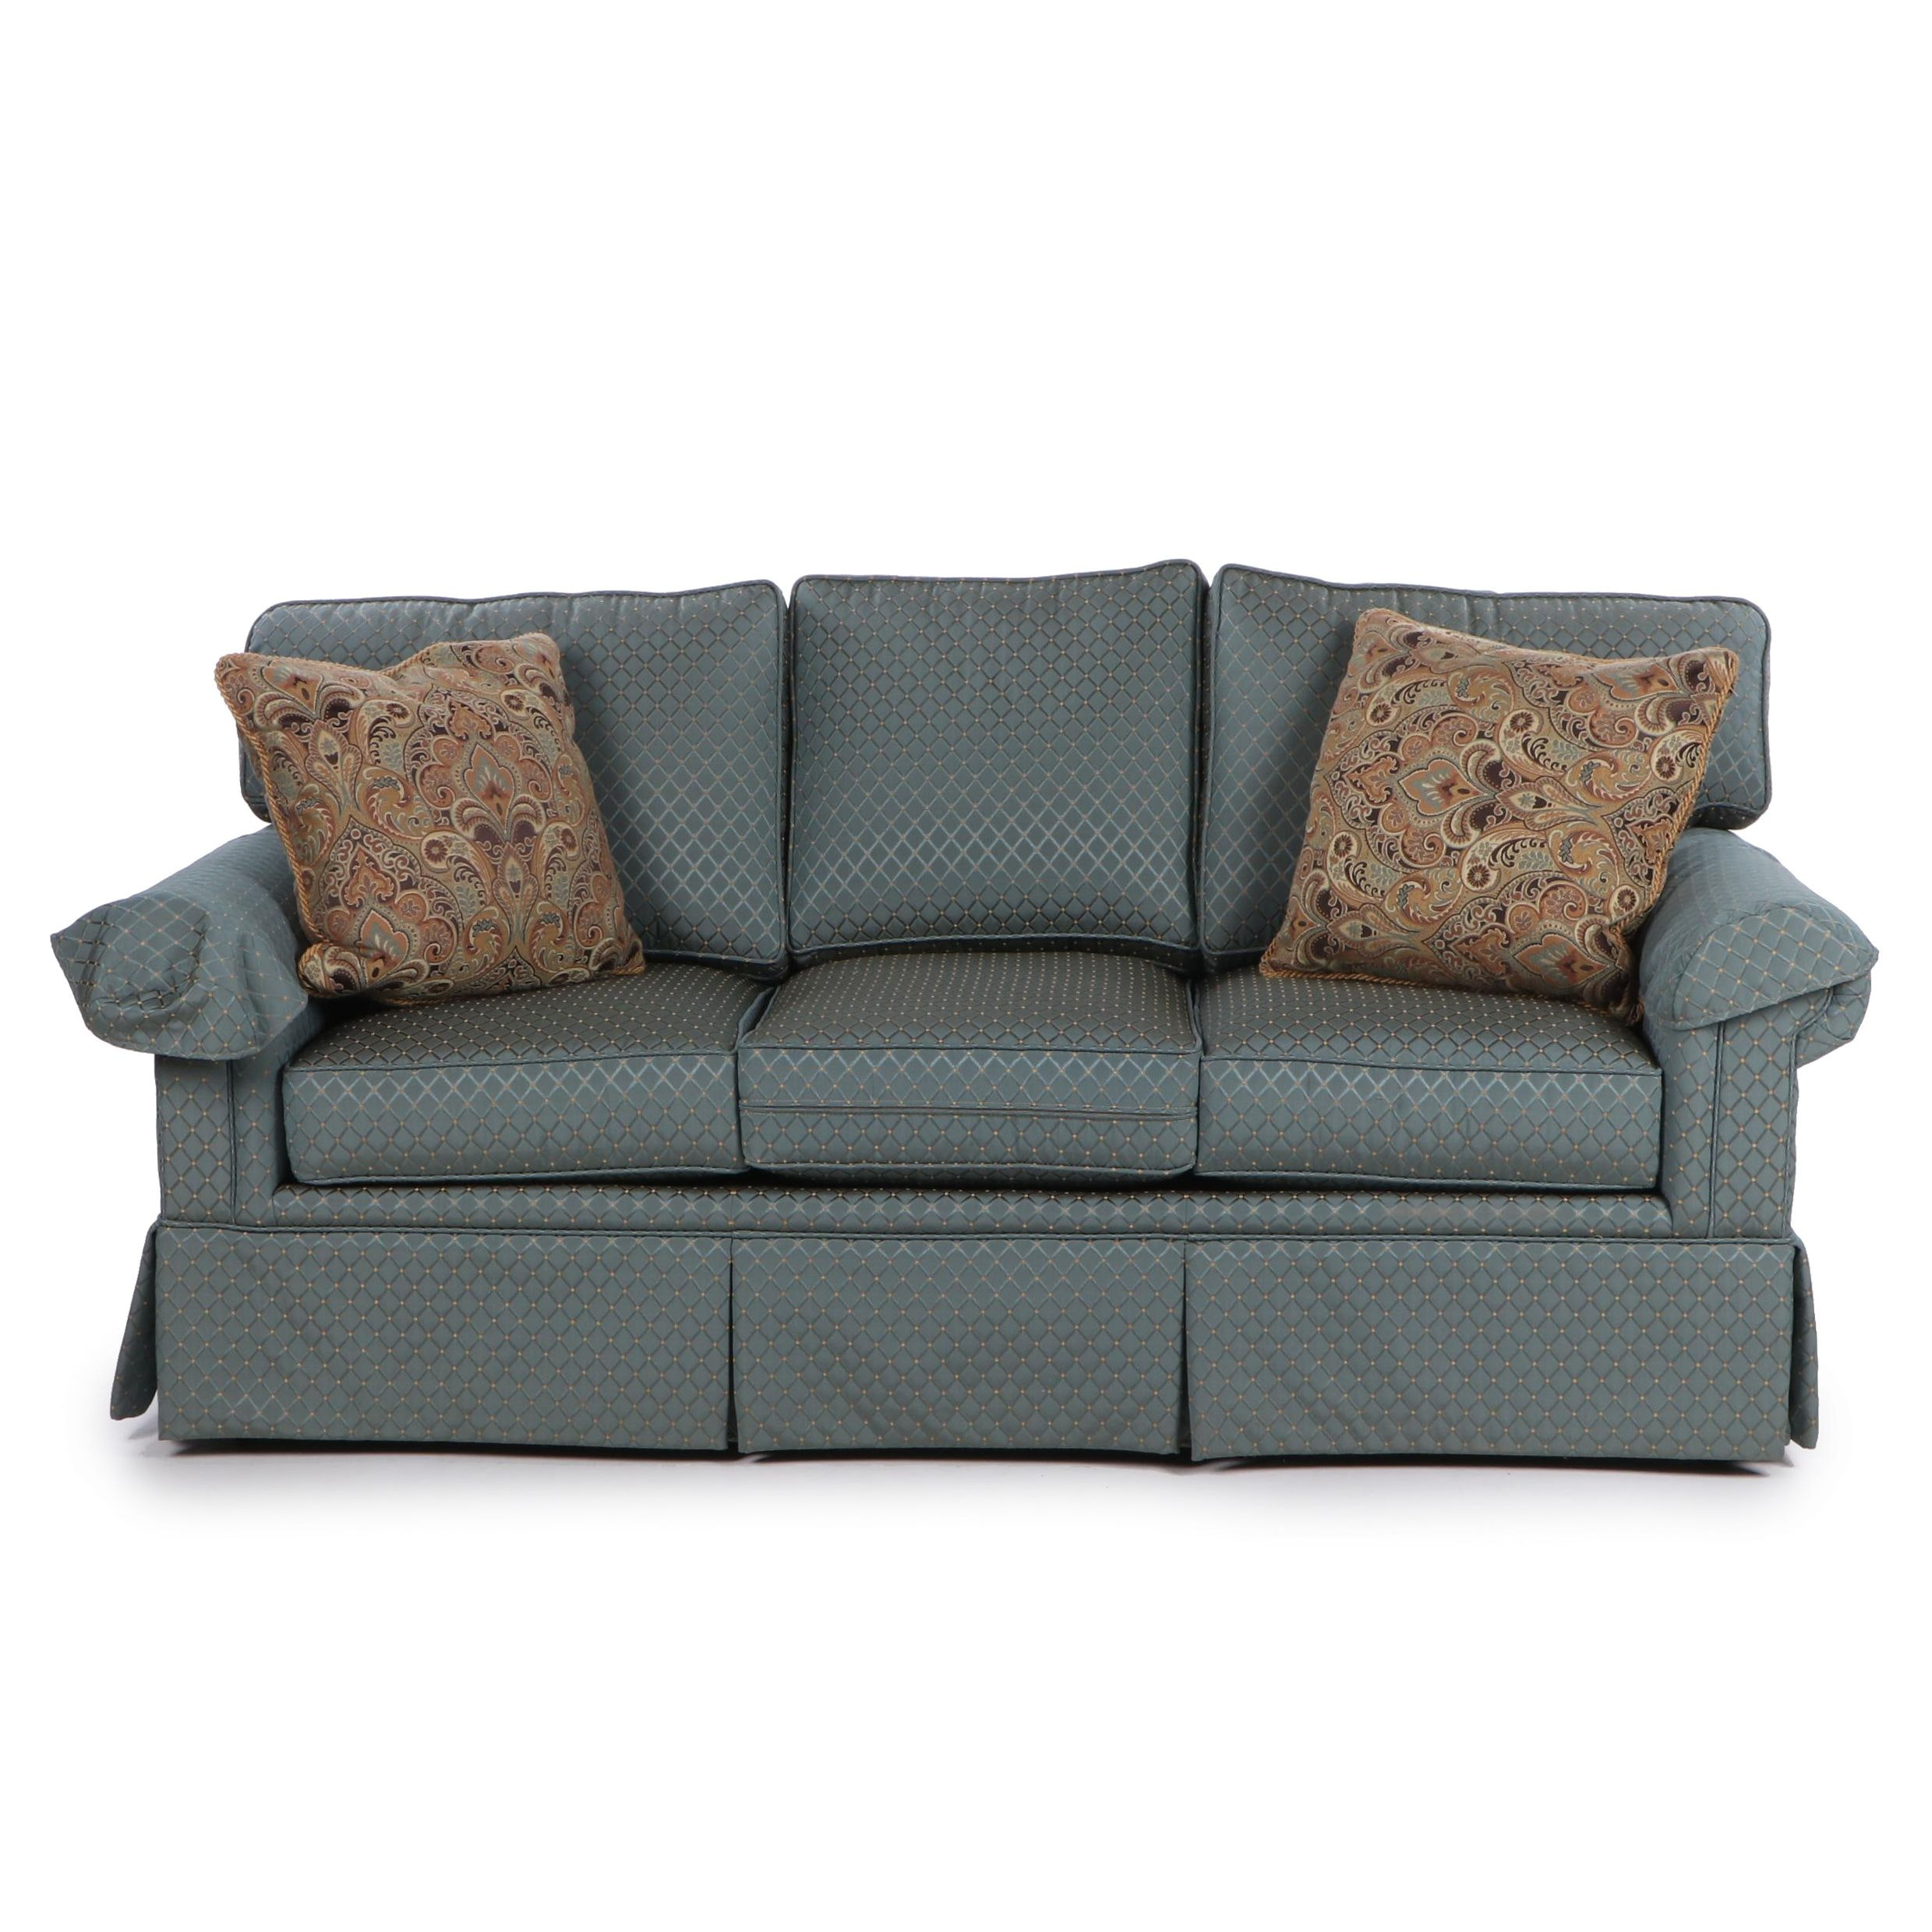 Huntington House Three Cushion Roll Arm Sofa, Contemporary